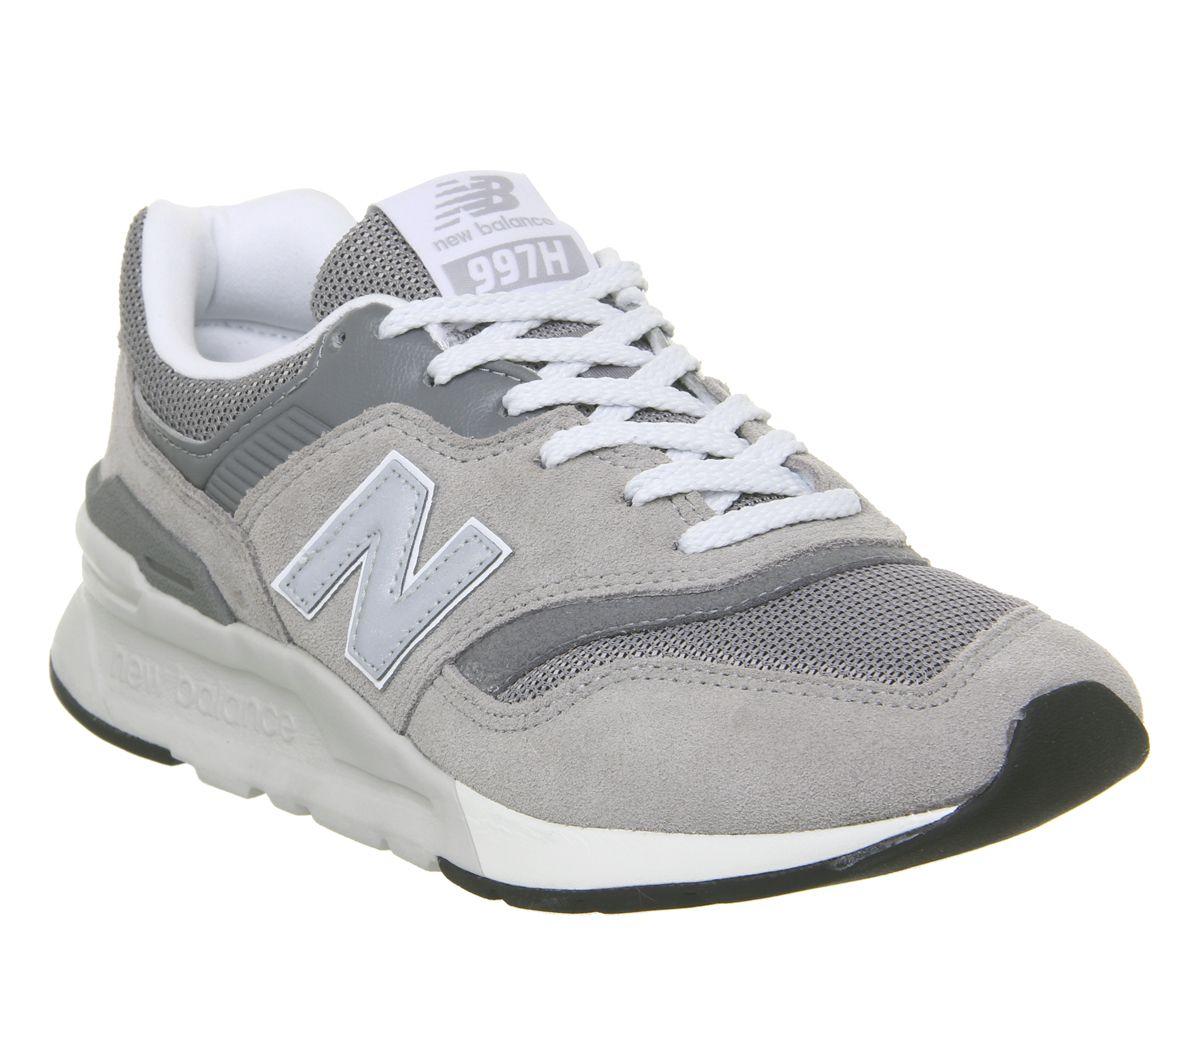 zapatillas new balance 997